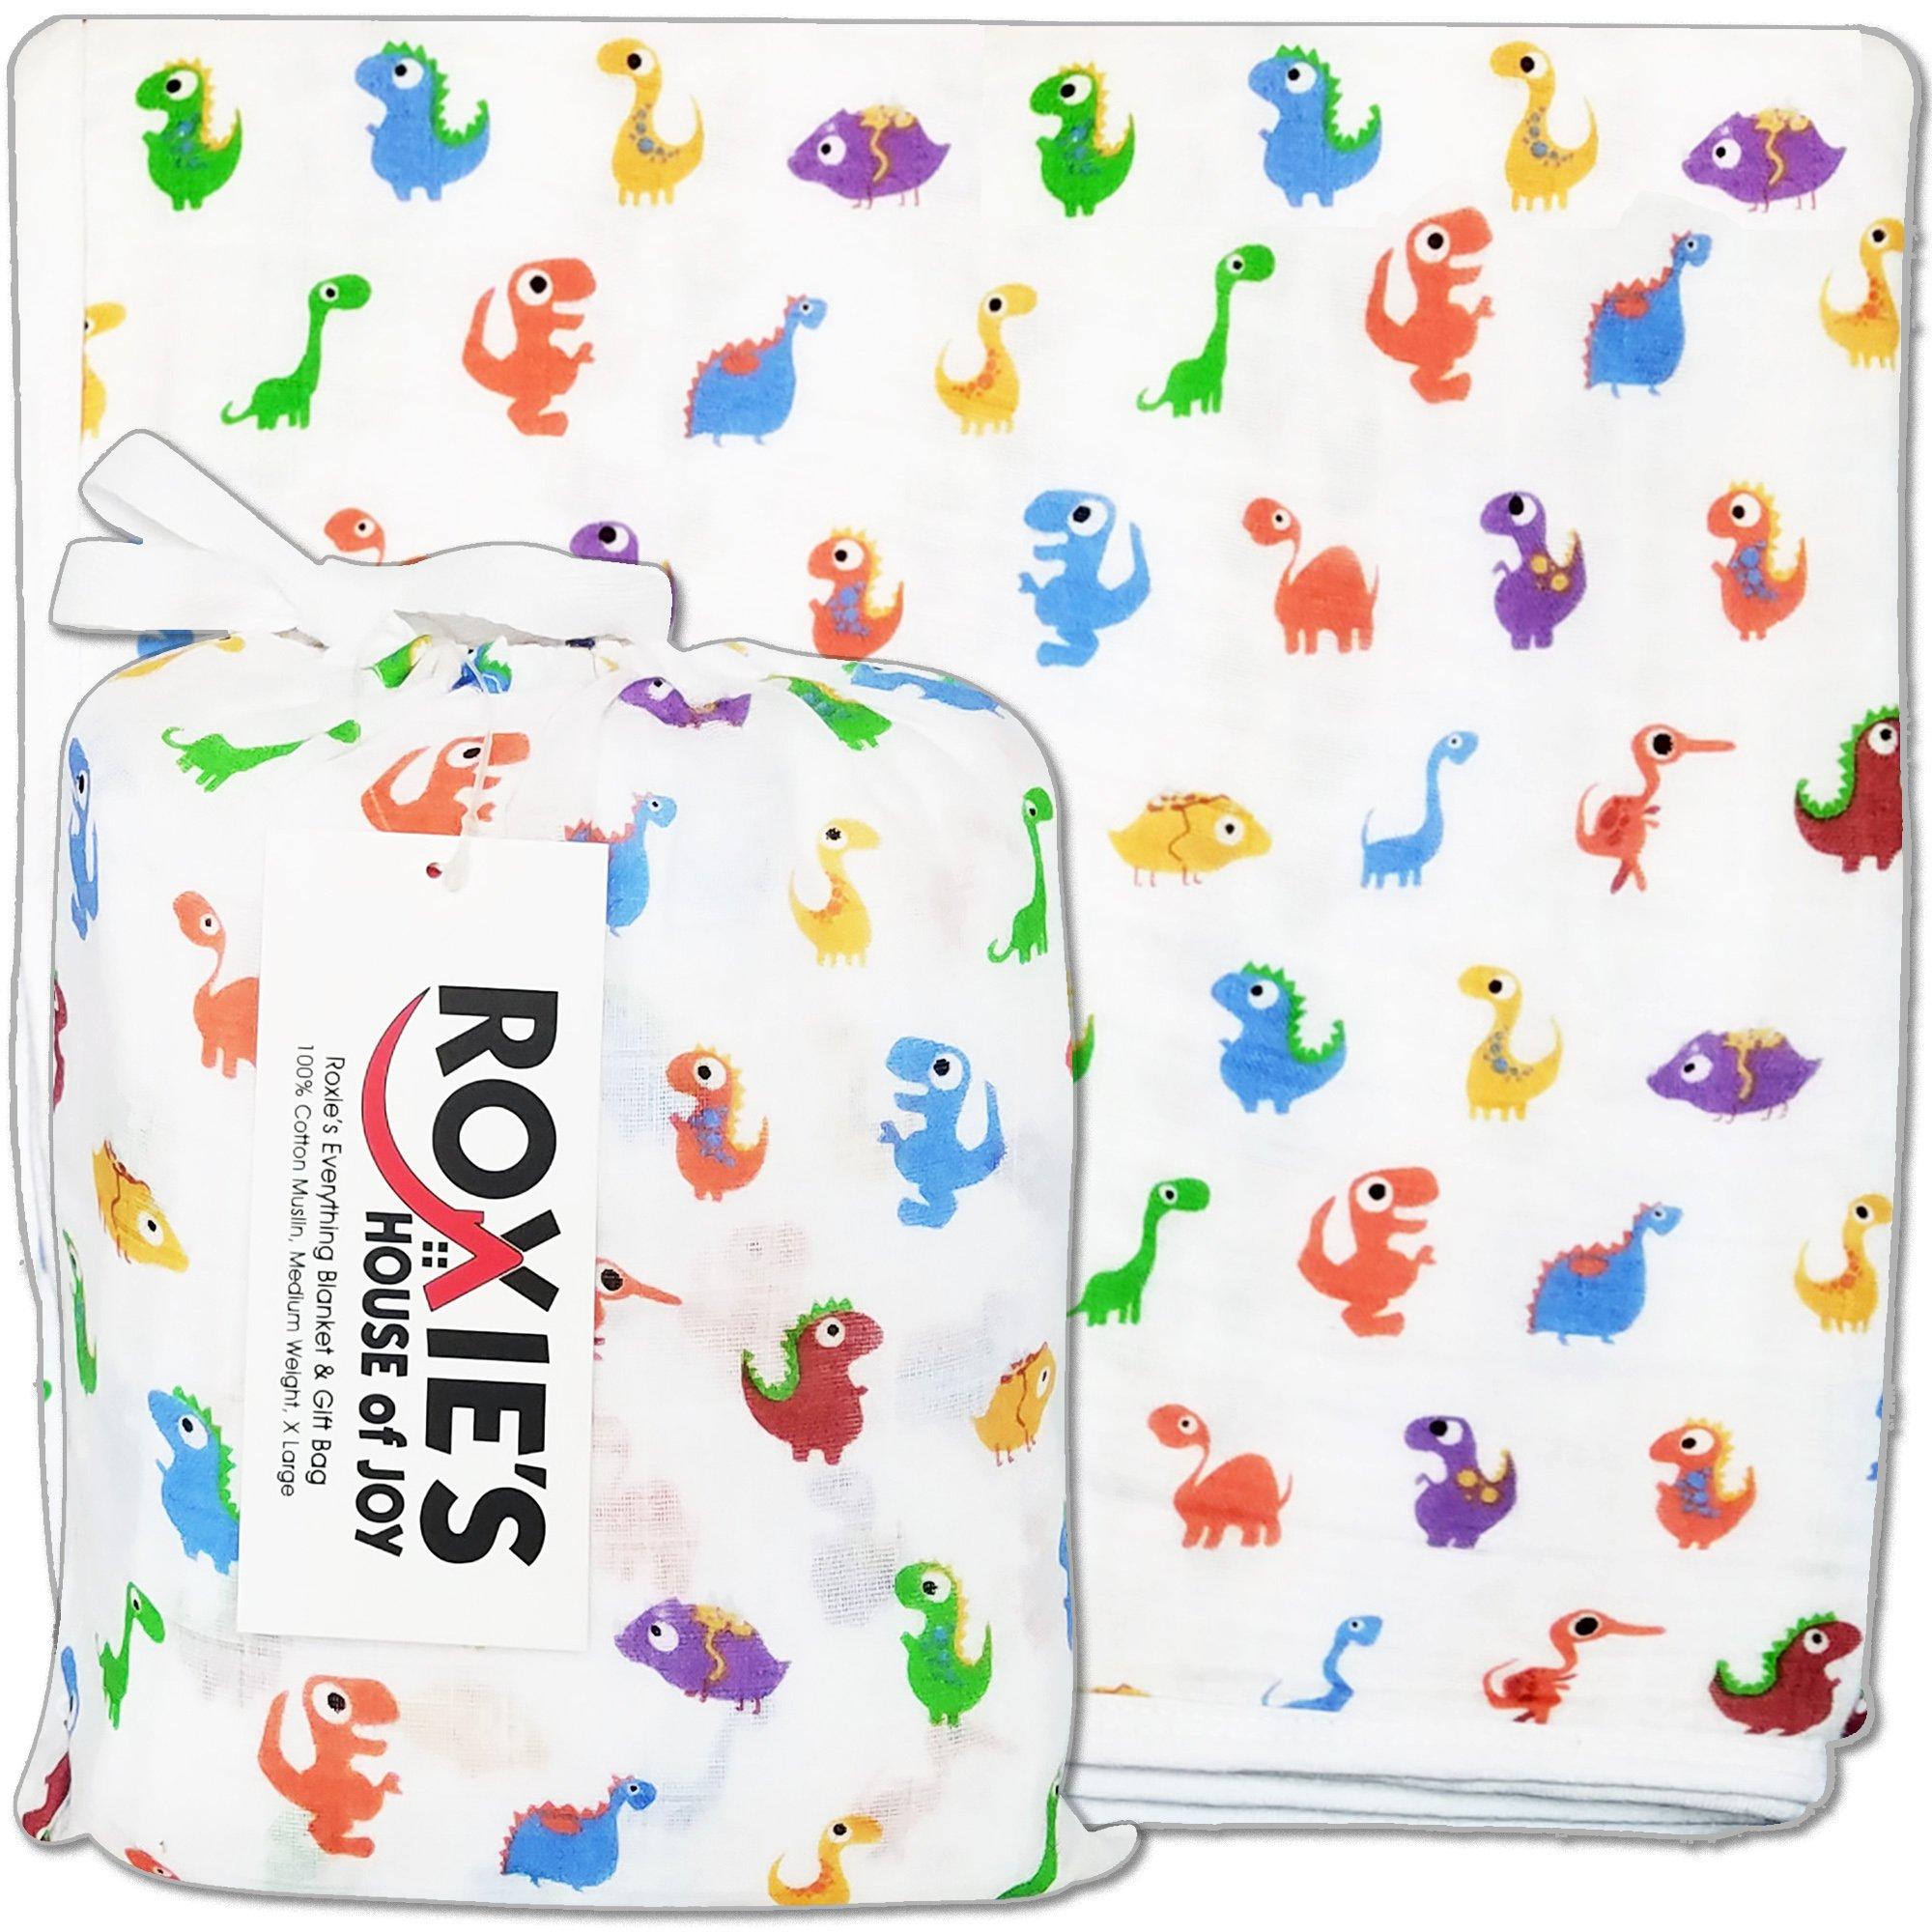 Everything Cotton Baby Toddler Blanket - Security Stroller Crib Registry,, Dinosaurs